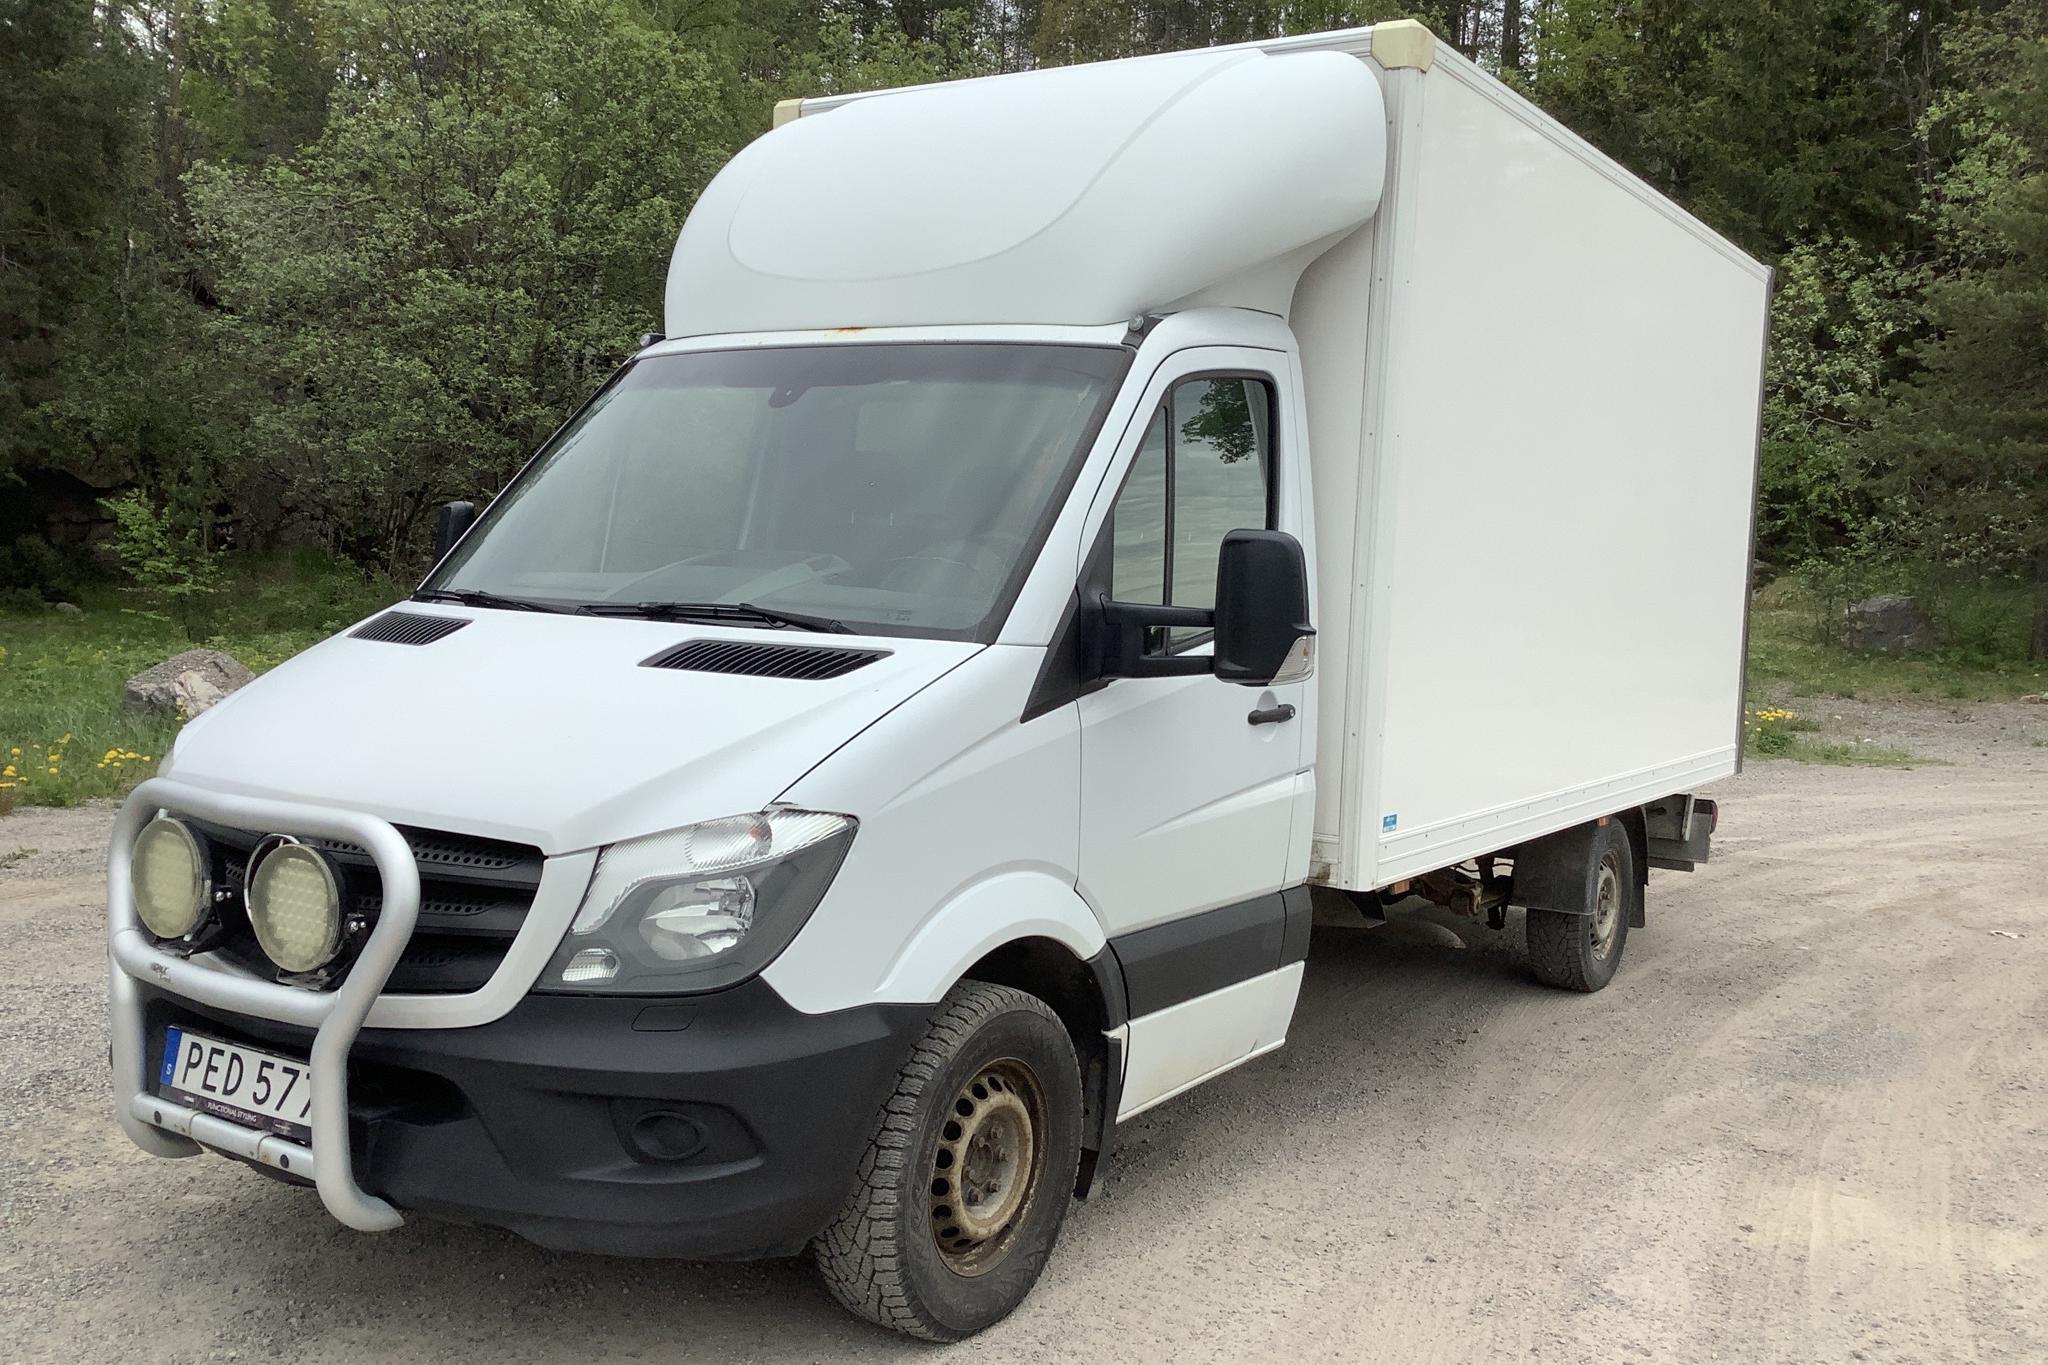 Mercedes Sprinter 316 CDI Volymskåp (163hk) - 321 740 km - Manual - white - 2017